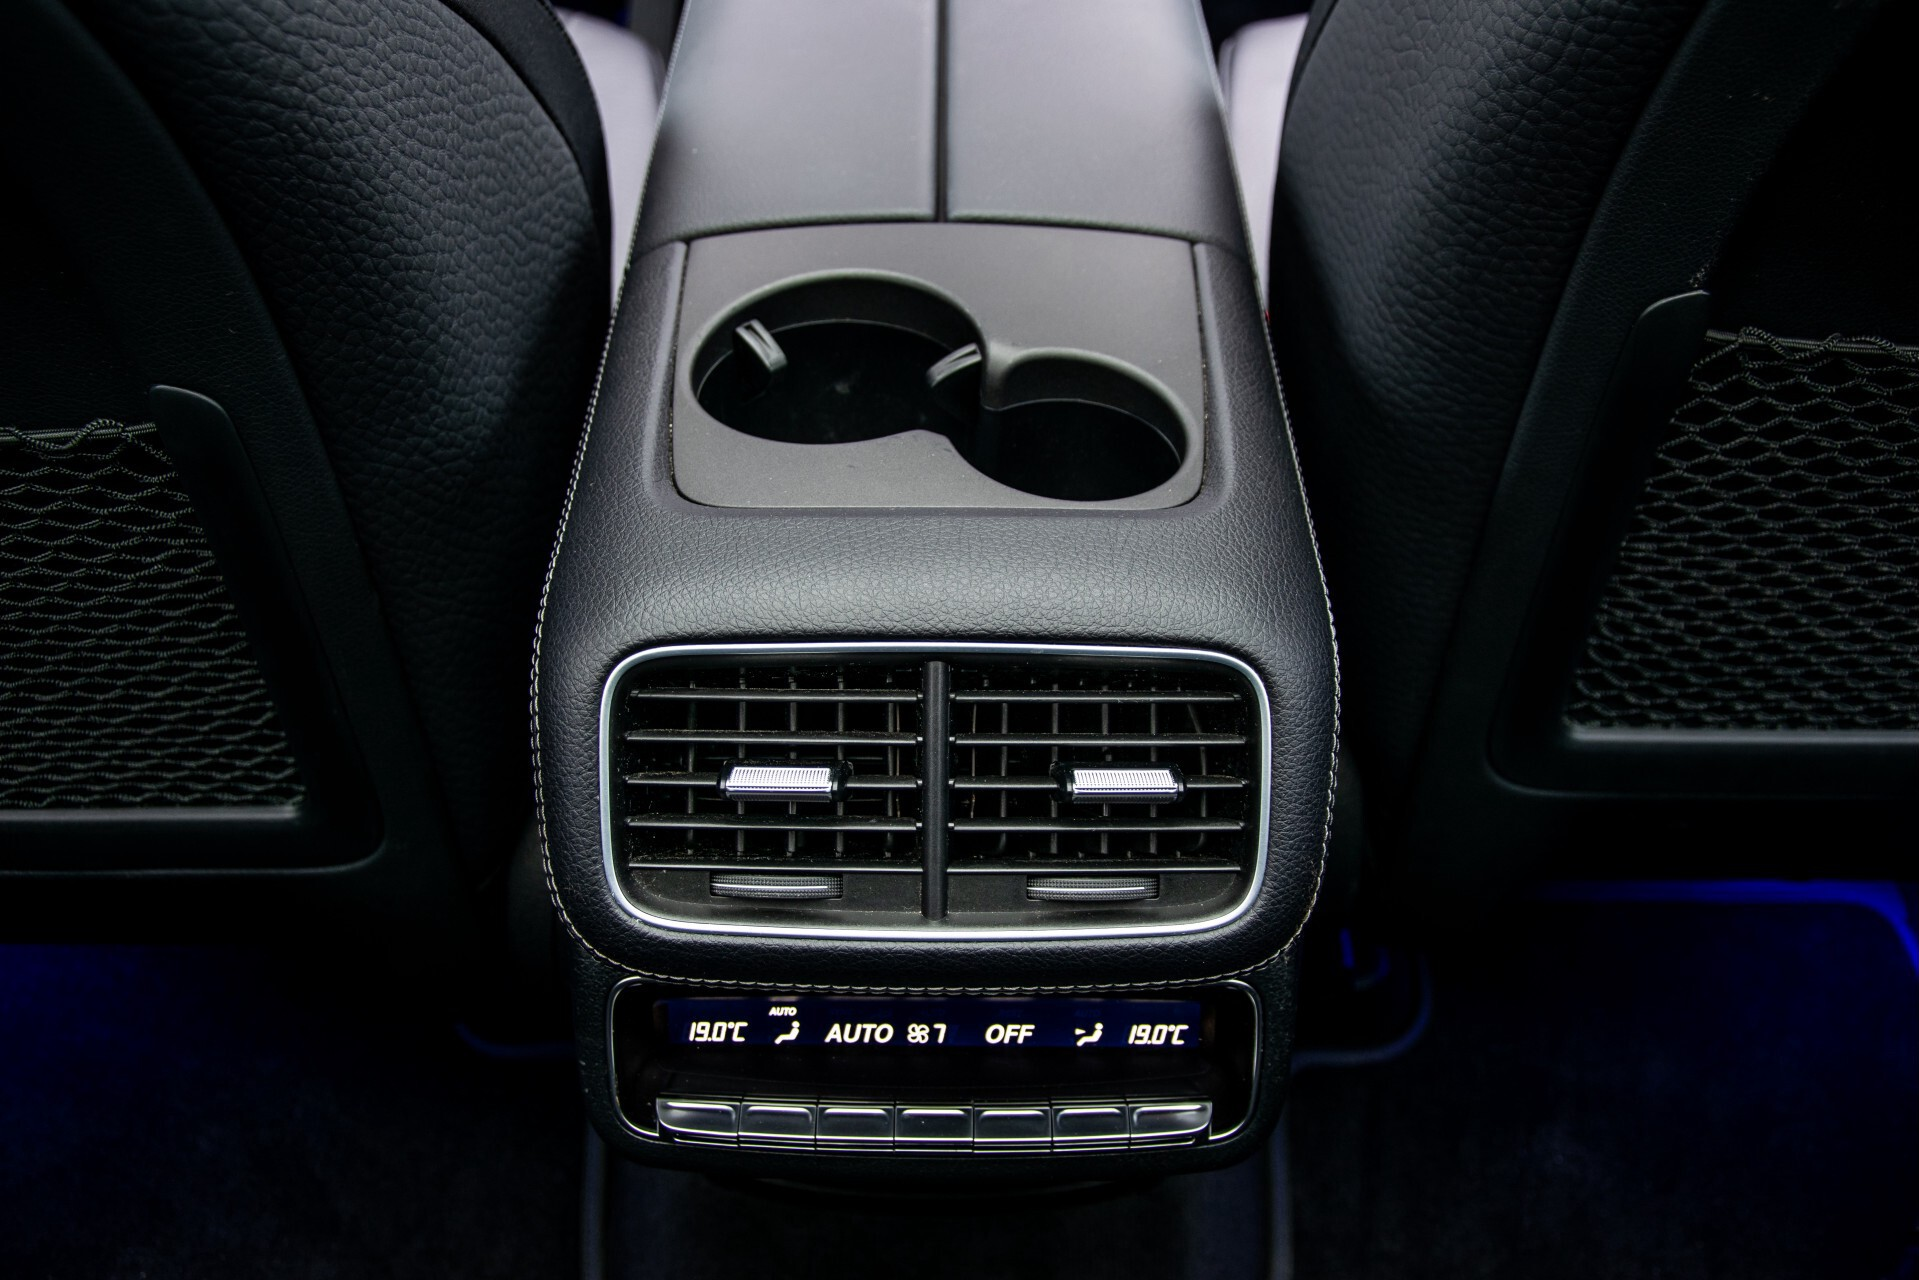 Mercedes-Benz GLE 450 4-M 7-Persoons AMG Massage/Rij-assist/Keyless/TV/360/Night/Trekhaak Aut9 Foto 45